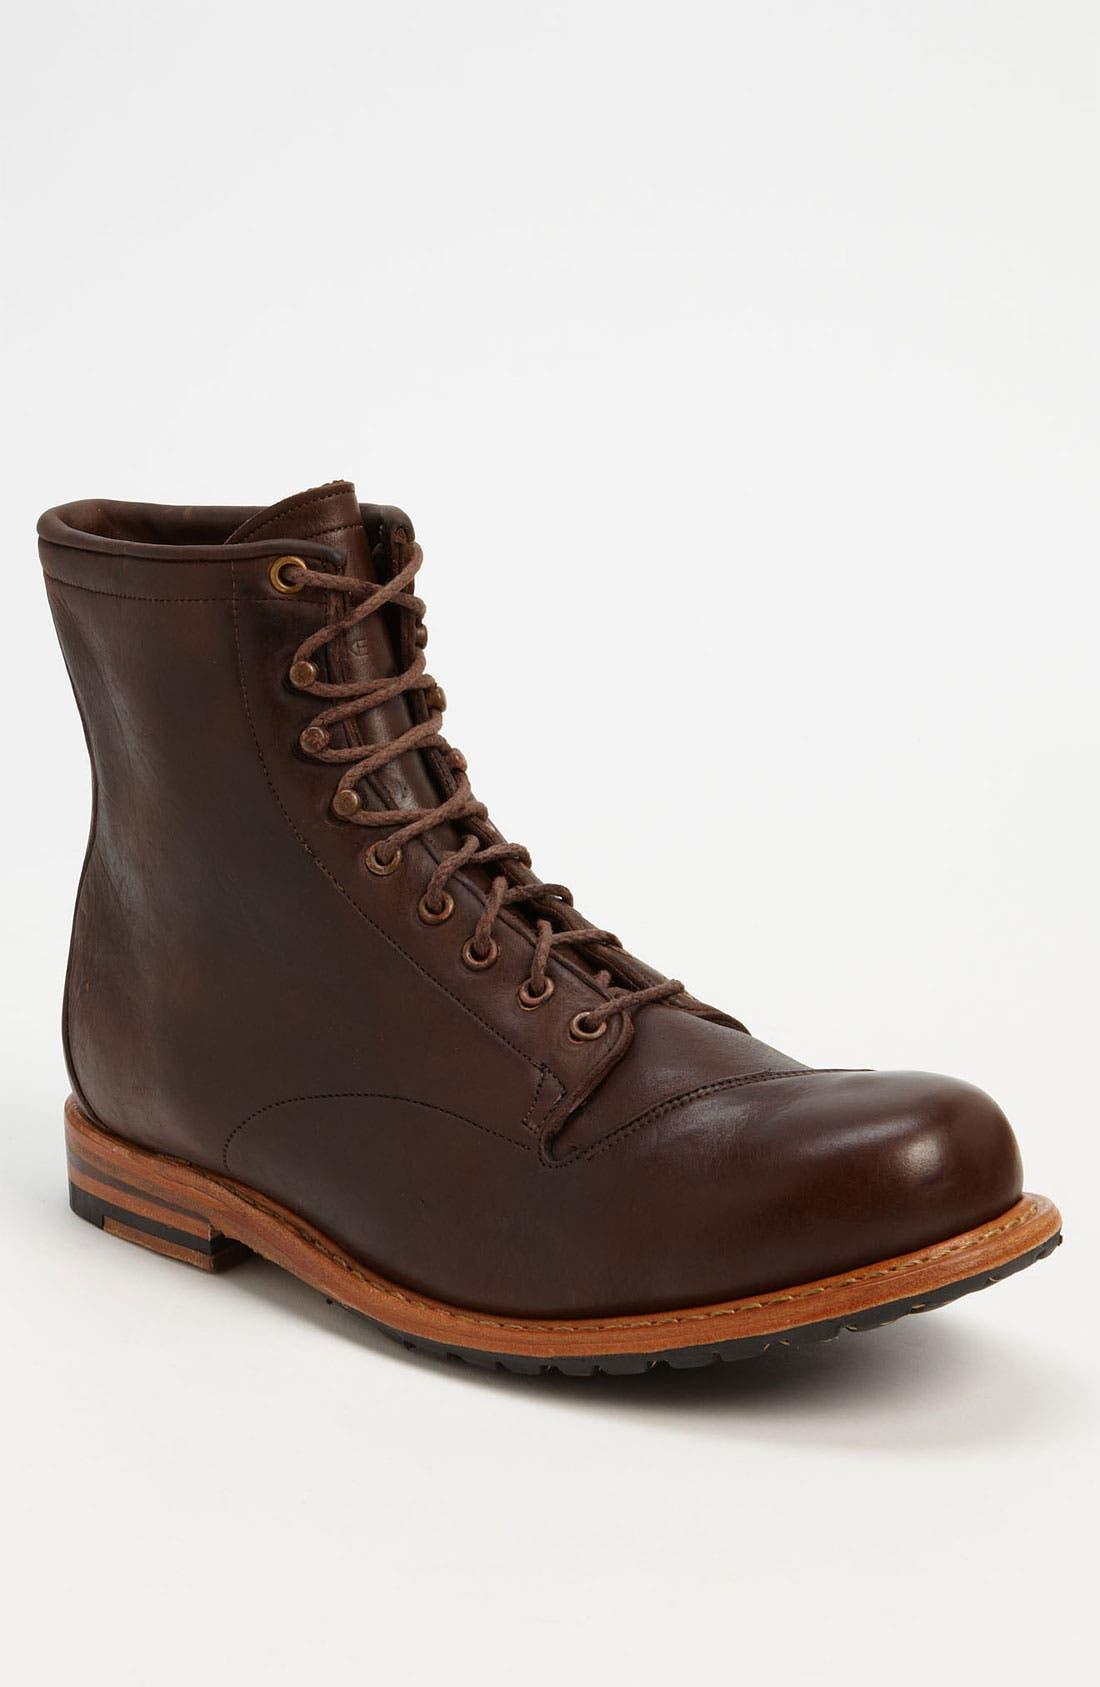 Alternate Image 1 Selected - Timberland Boot Company 'Blake Winter' Cap Toe Boot